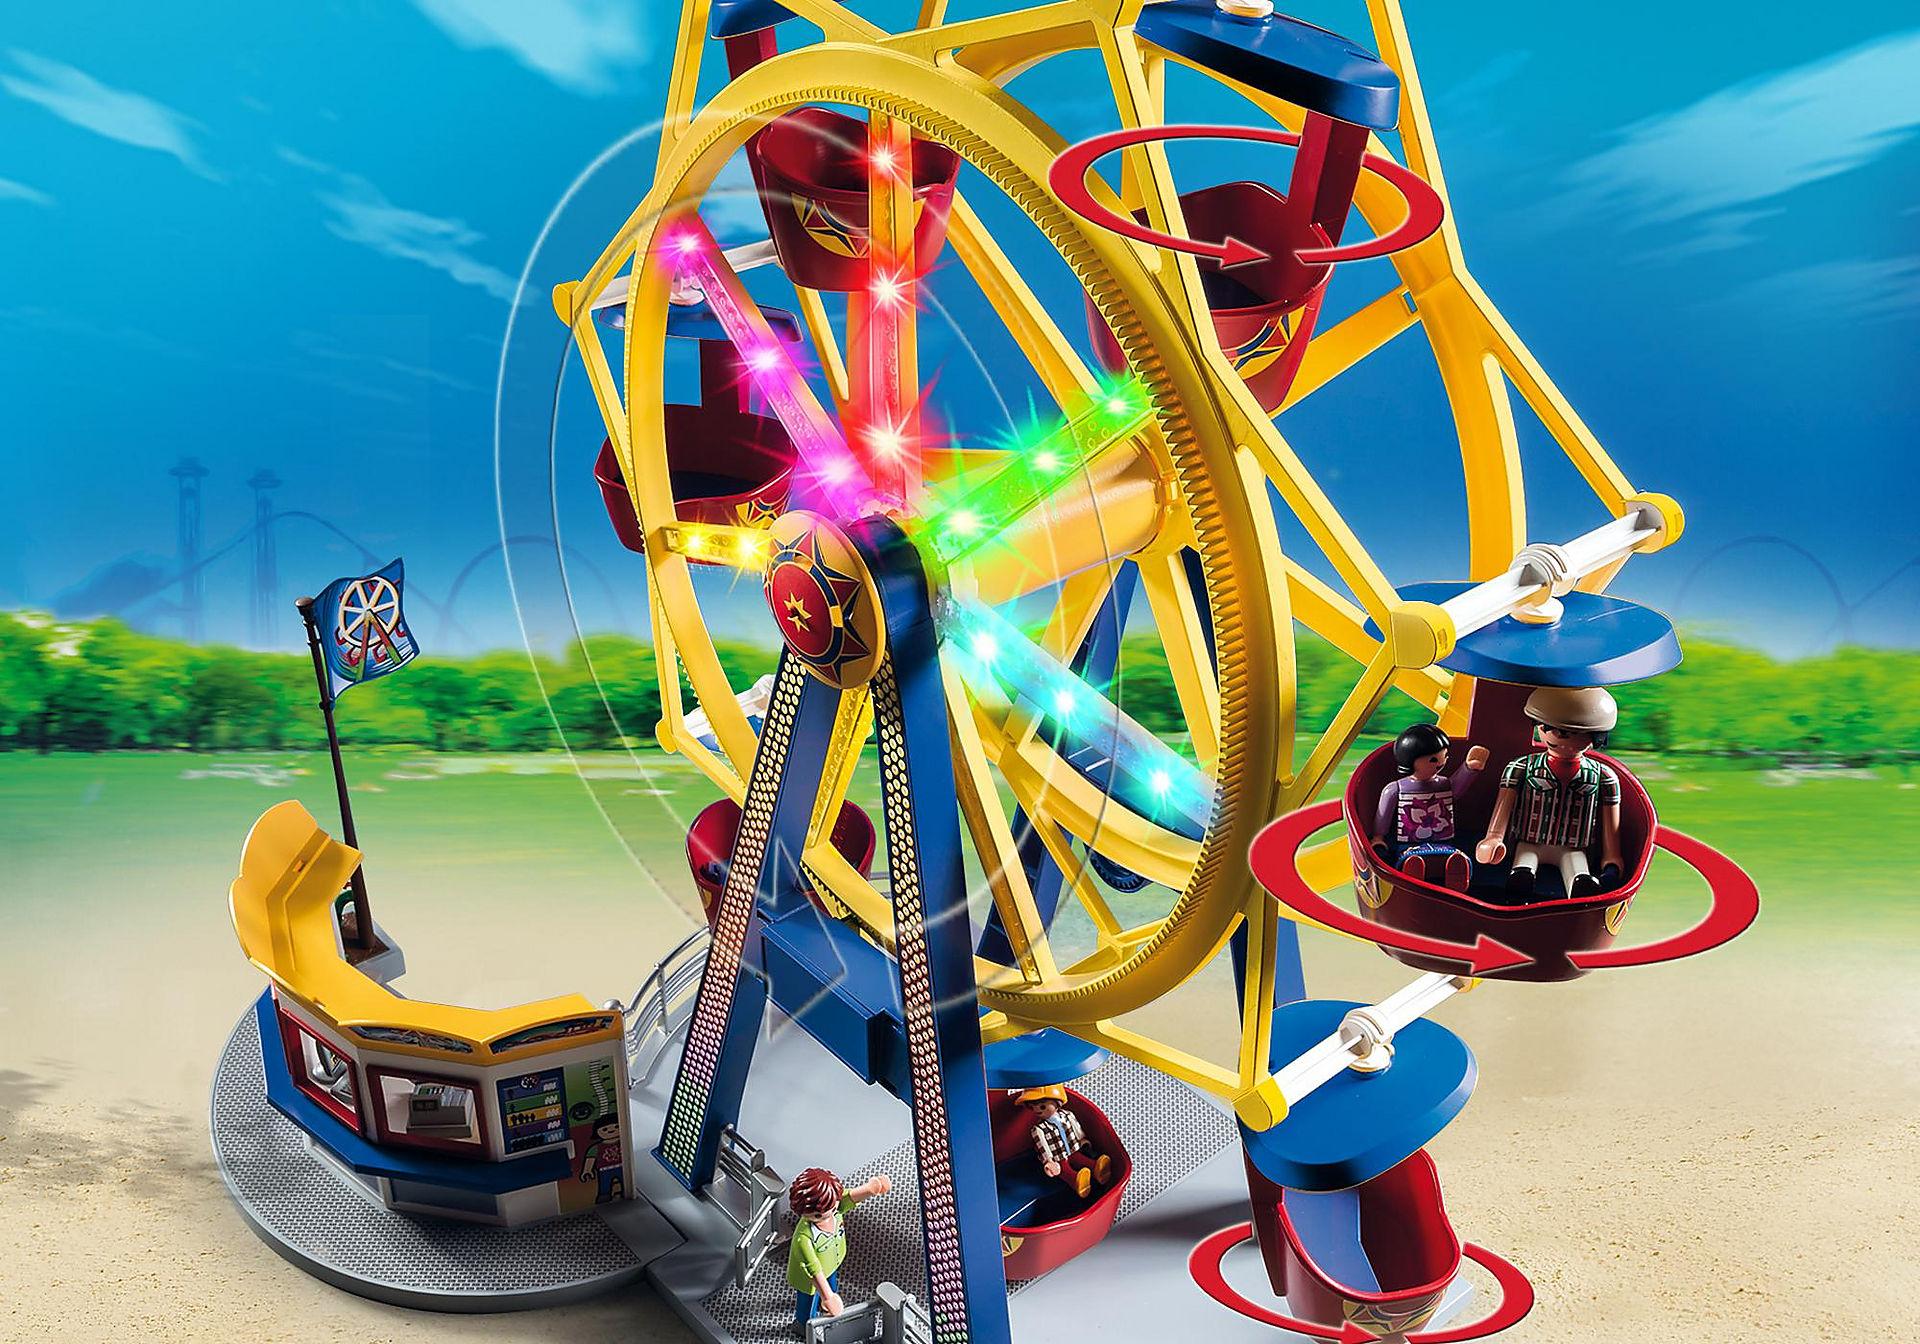 http://media.playmobil.com/i/playmobil/5552_product_extra3/Riesenrad mit bunter Beleuchtung